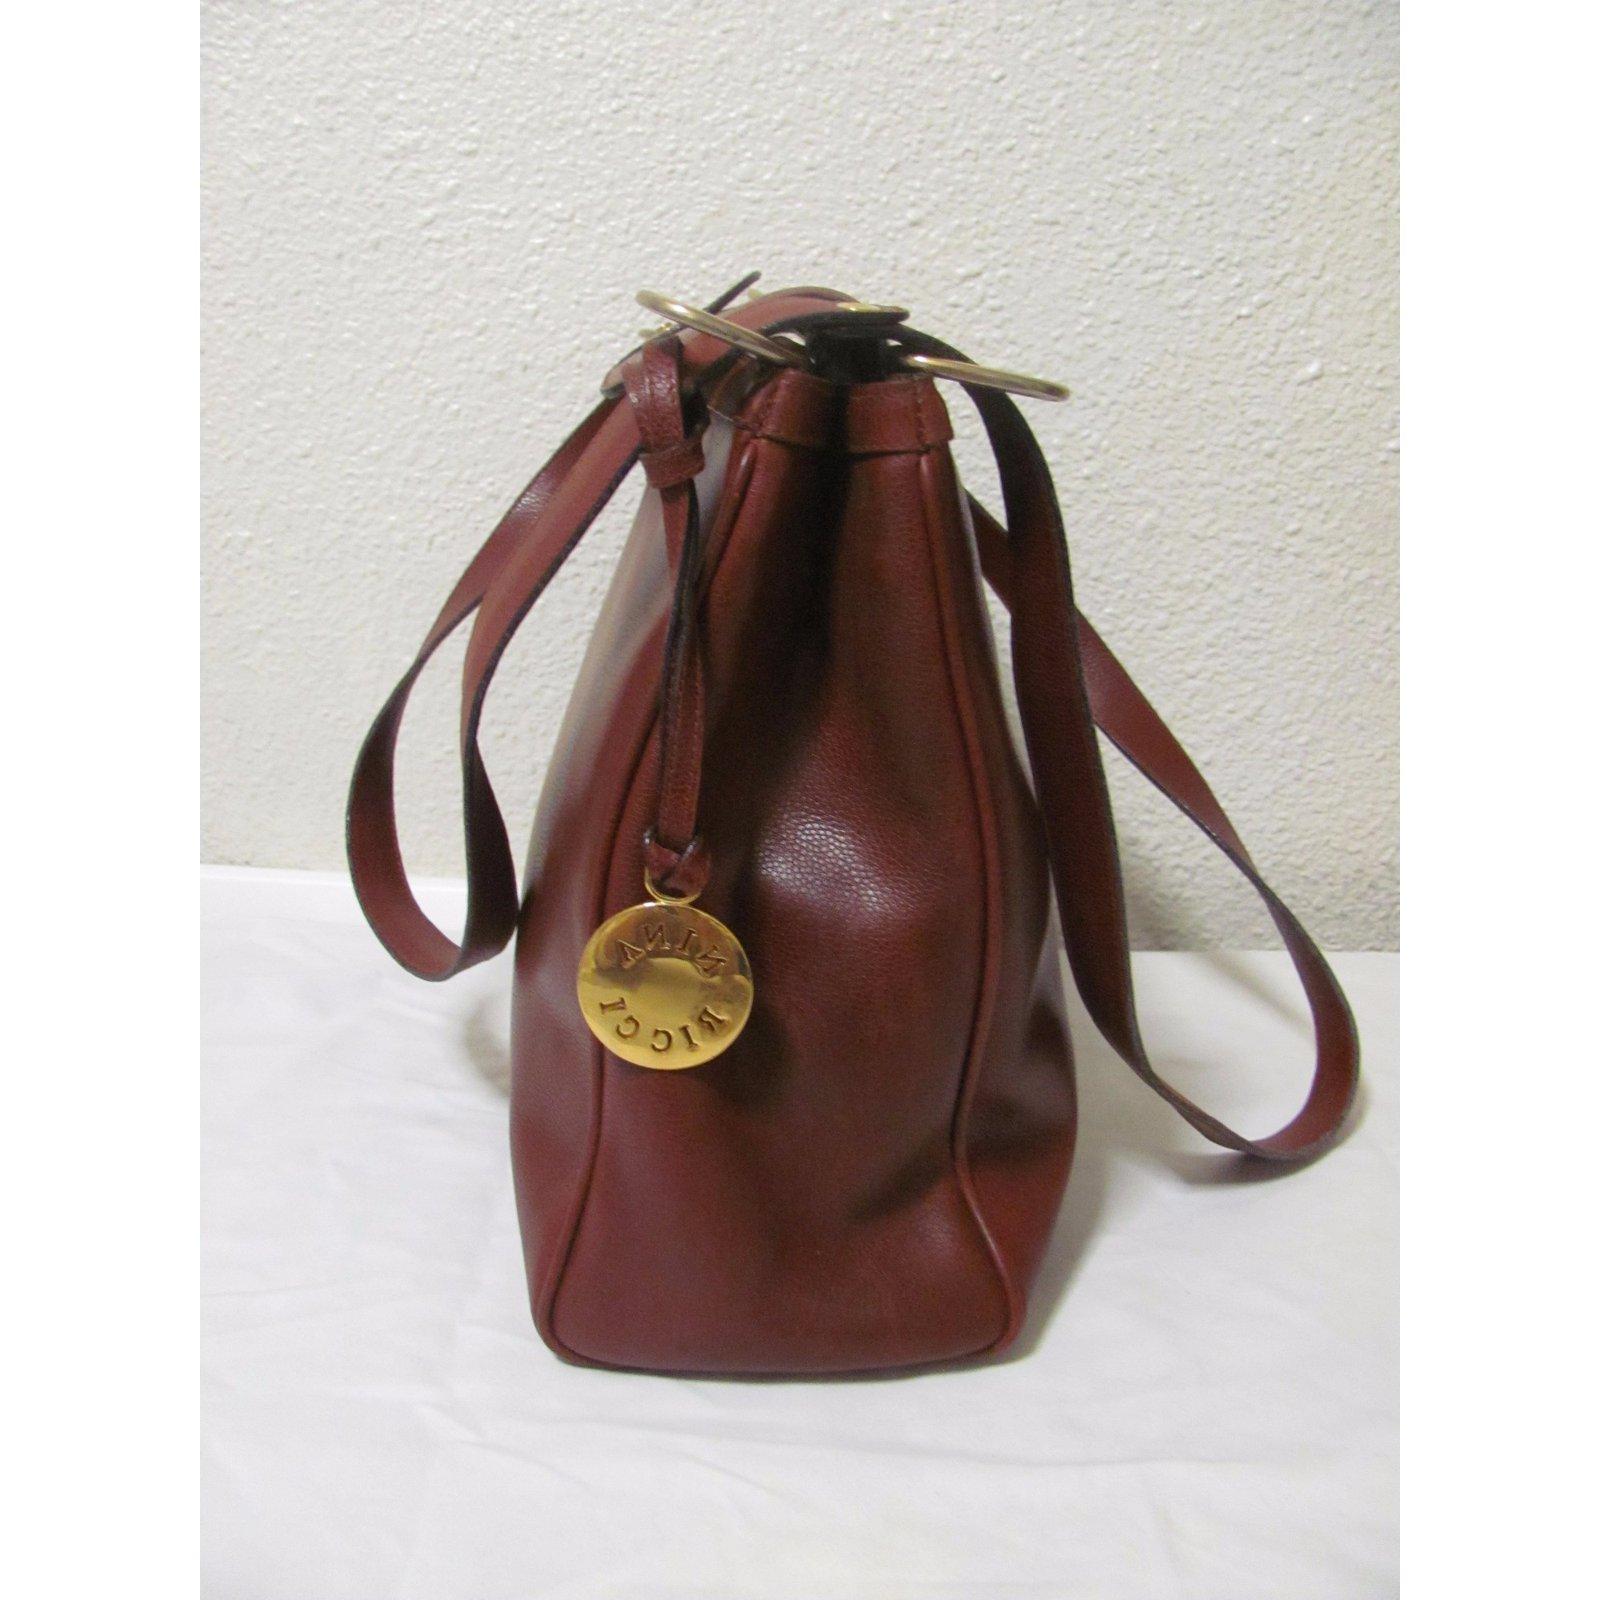 84525747371 Nina Ricci Handbag Handbags Leather Dark red,Caramel ref.28520 - Joli Closet